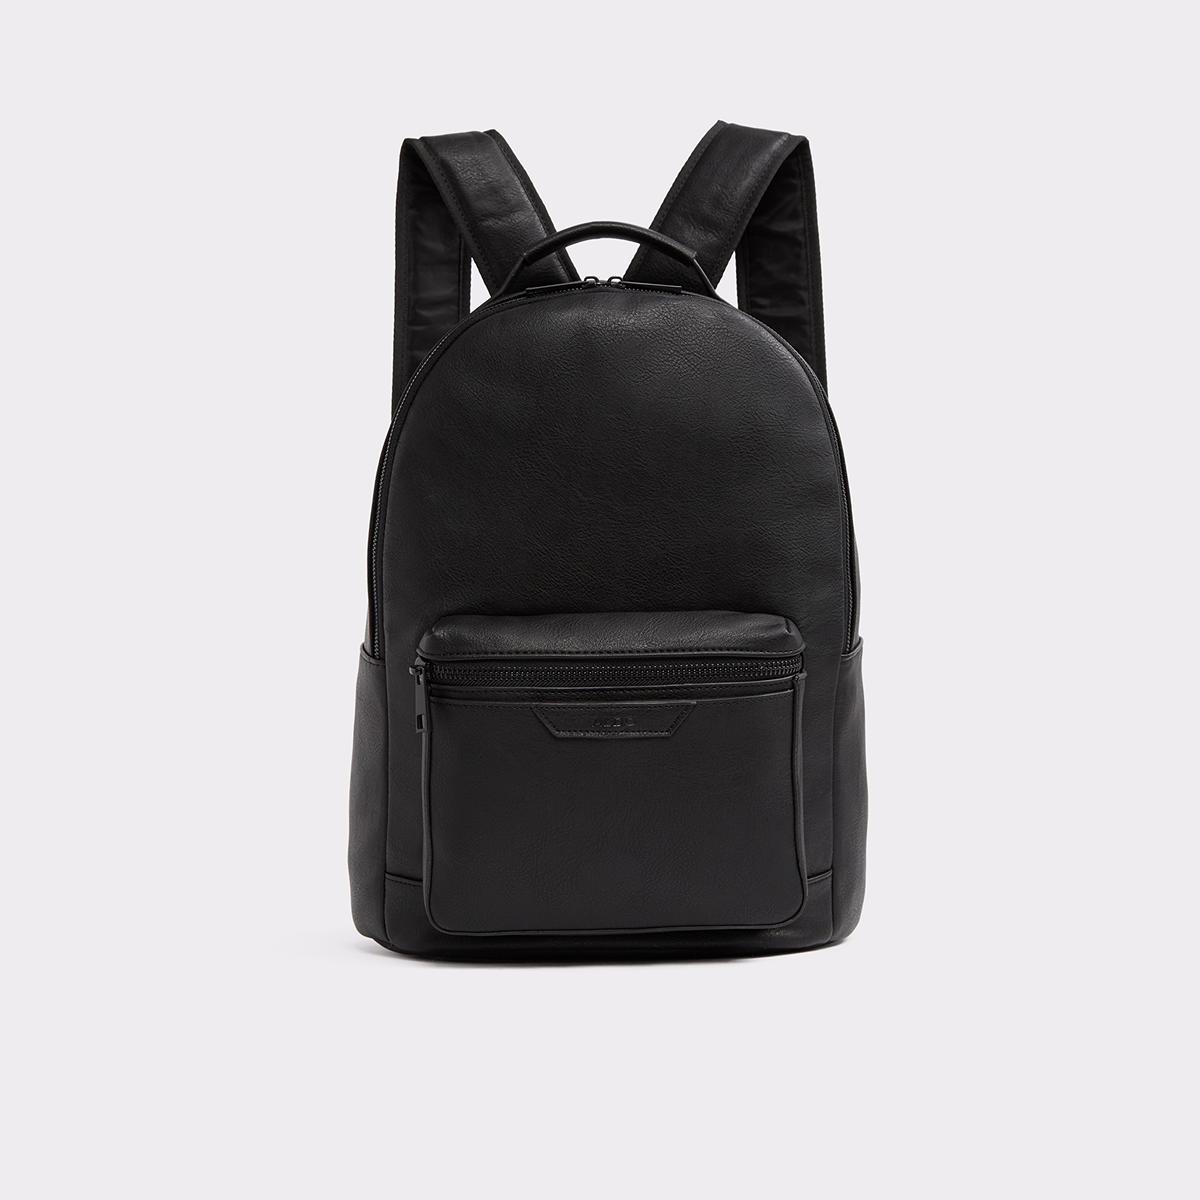 132d0abe77a Agraella Black Velvet Men s Bags   wallets